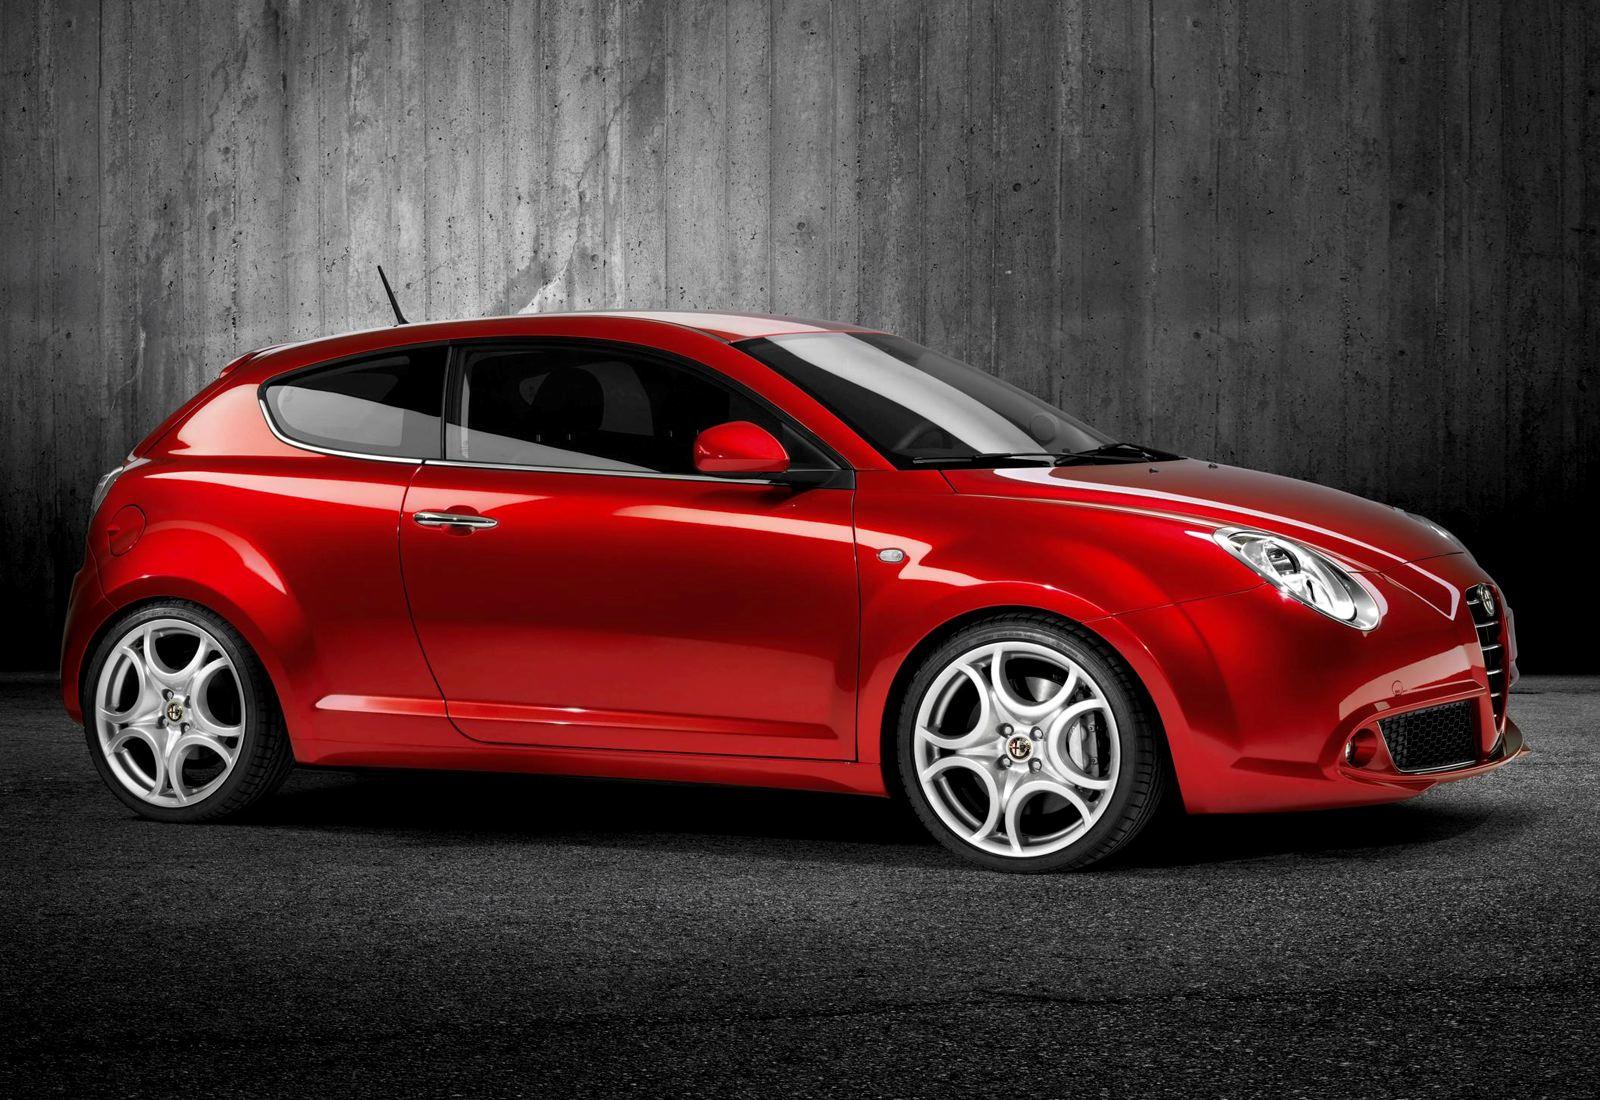 http://1.bp.blogspot.com/-XDeWFM9EEWs/Tc92Xi5MBQI/AAAAAAAAABQ/Ymg4QPVtZ5o/s1600/2011-Alfa-Romeo-Mito-1.jpg